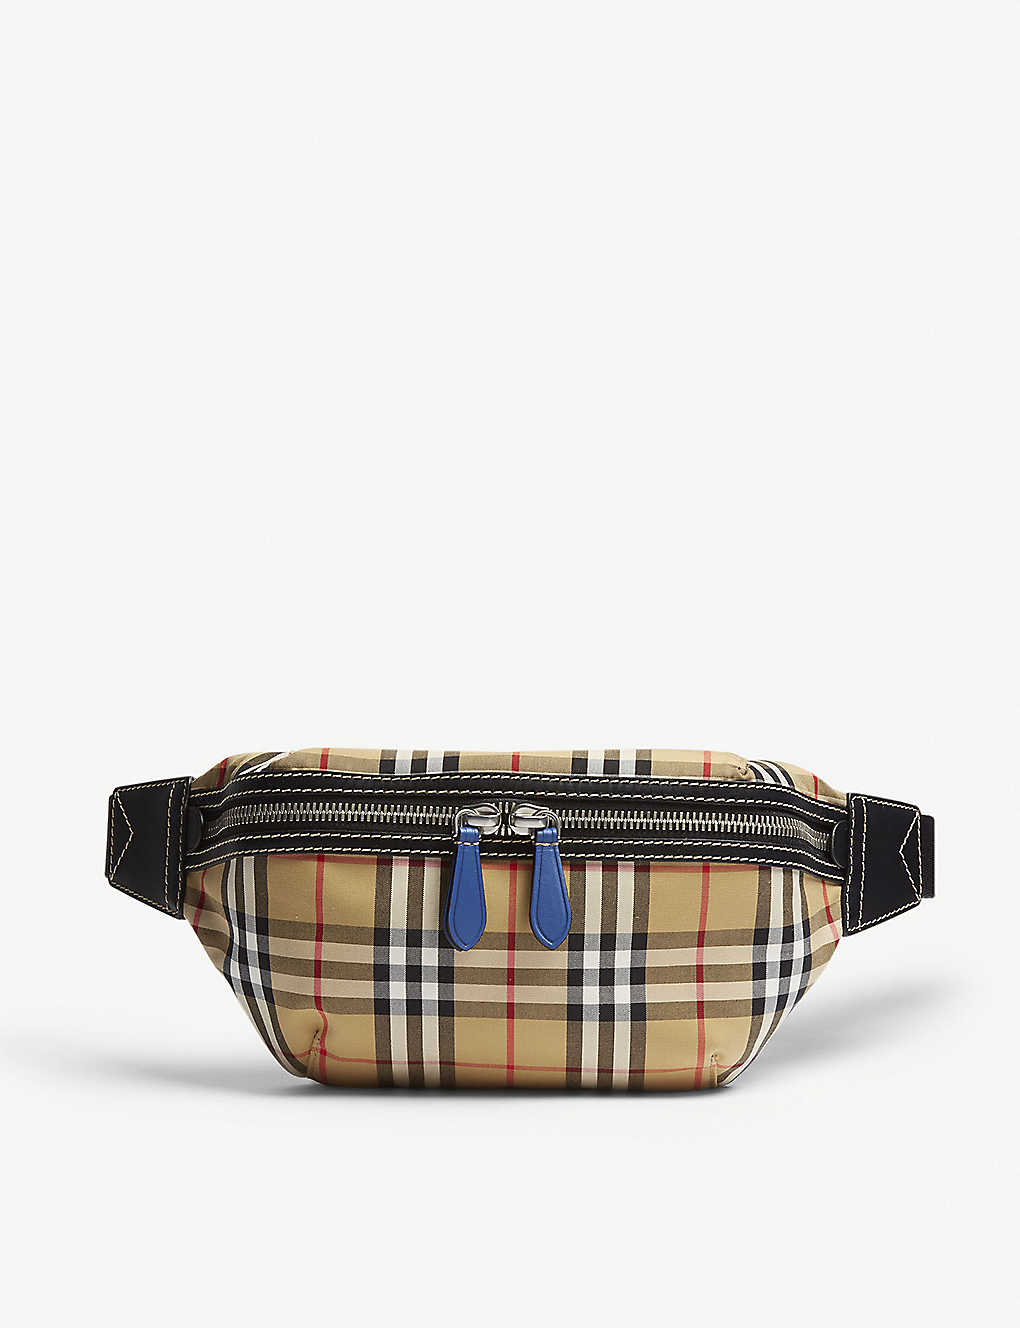 9dd9a26461f6 BURBERRY - Vintage check bum bag